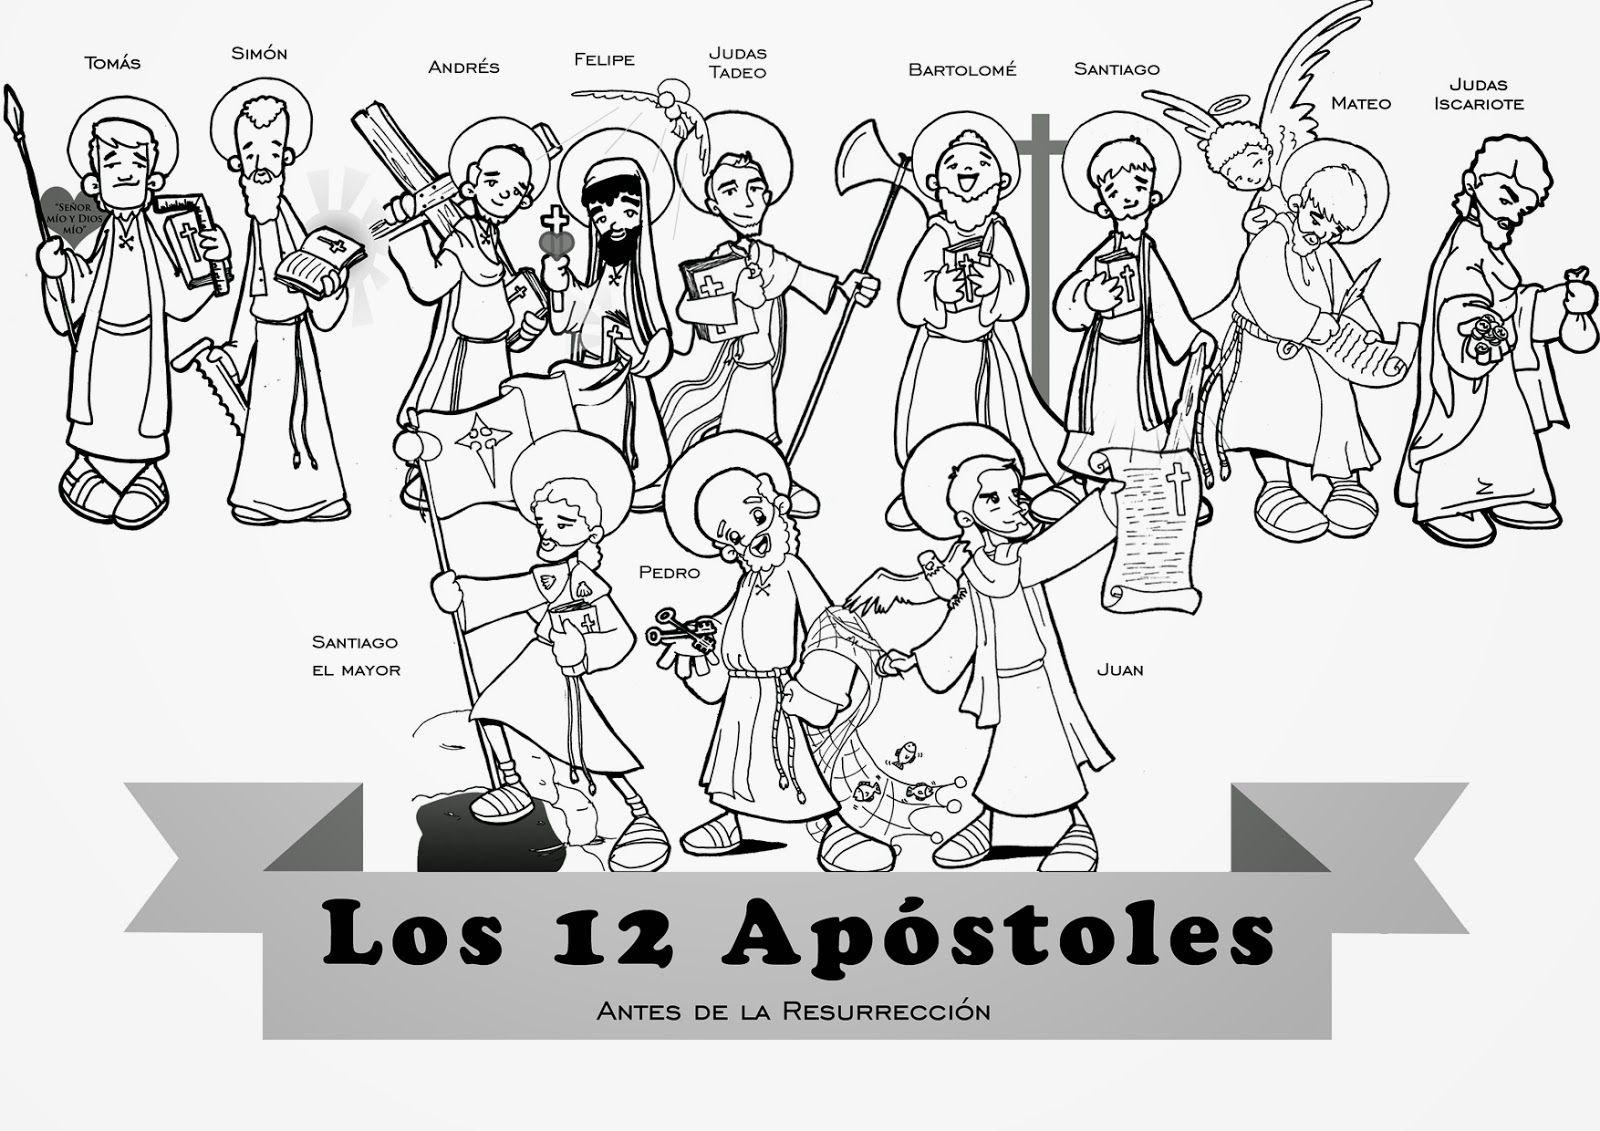 Dibujos para catequesis | religion | Pinterest | Religion, Religious ...